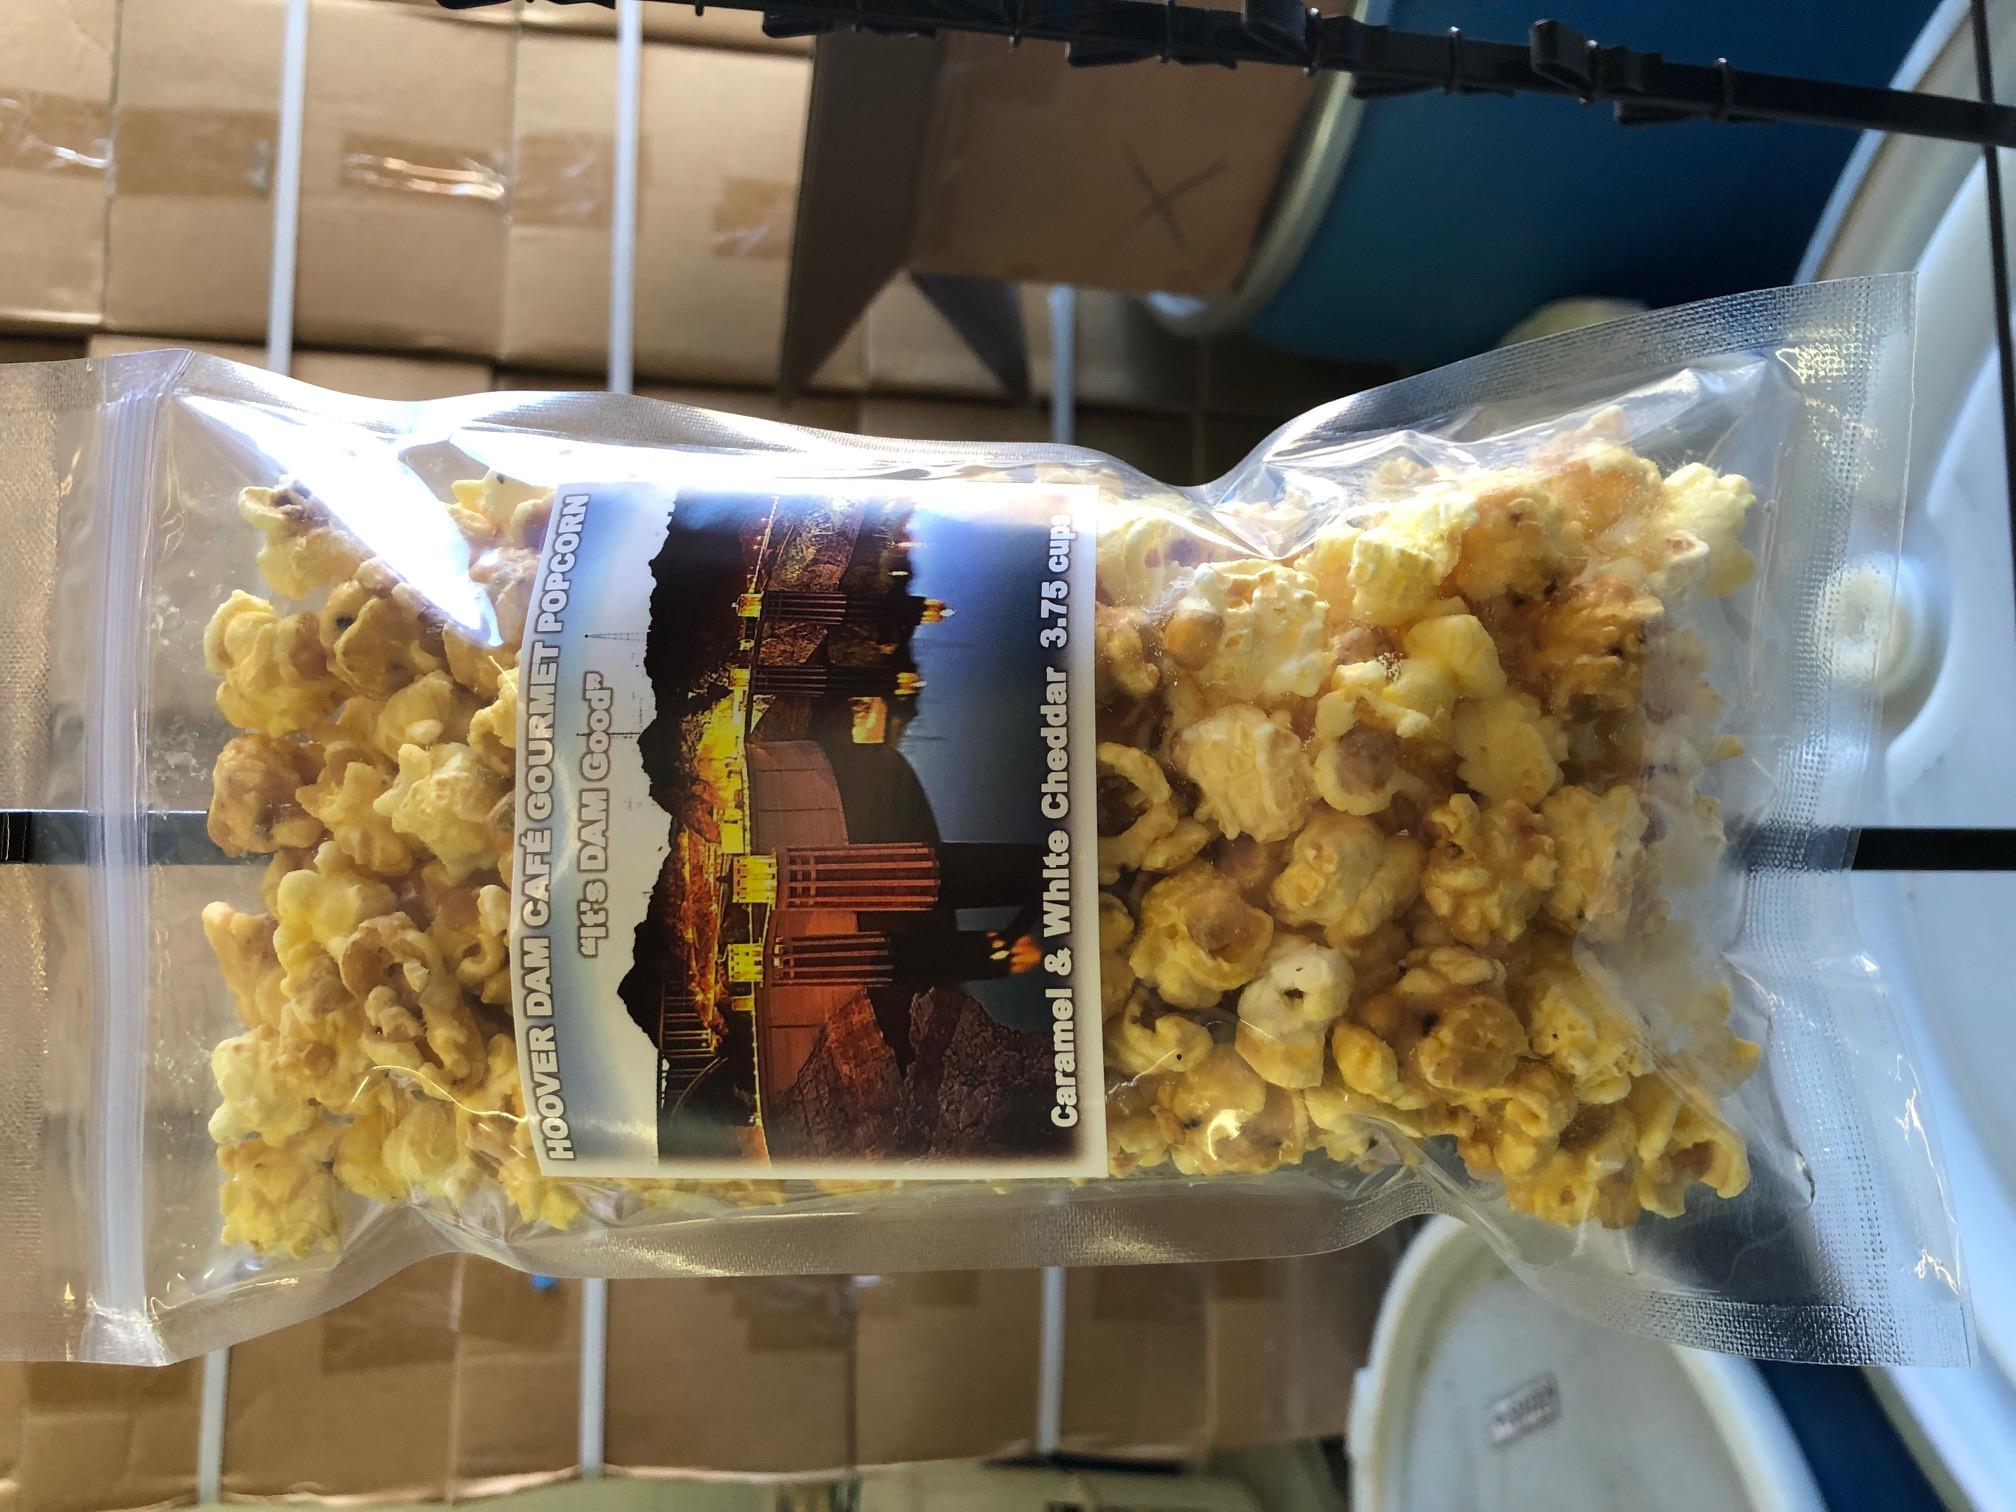 Hoover Dam Cafe' Caramel & White Cheddar